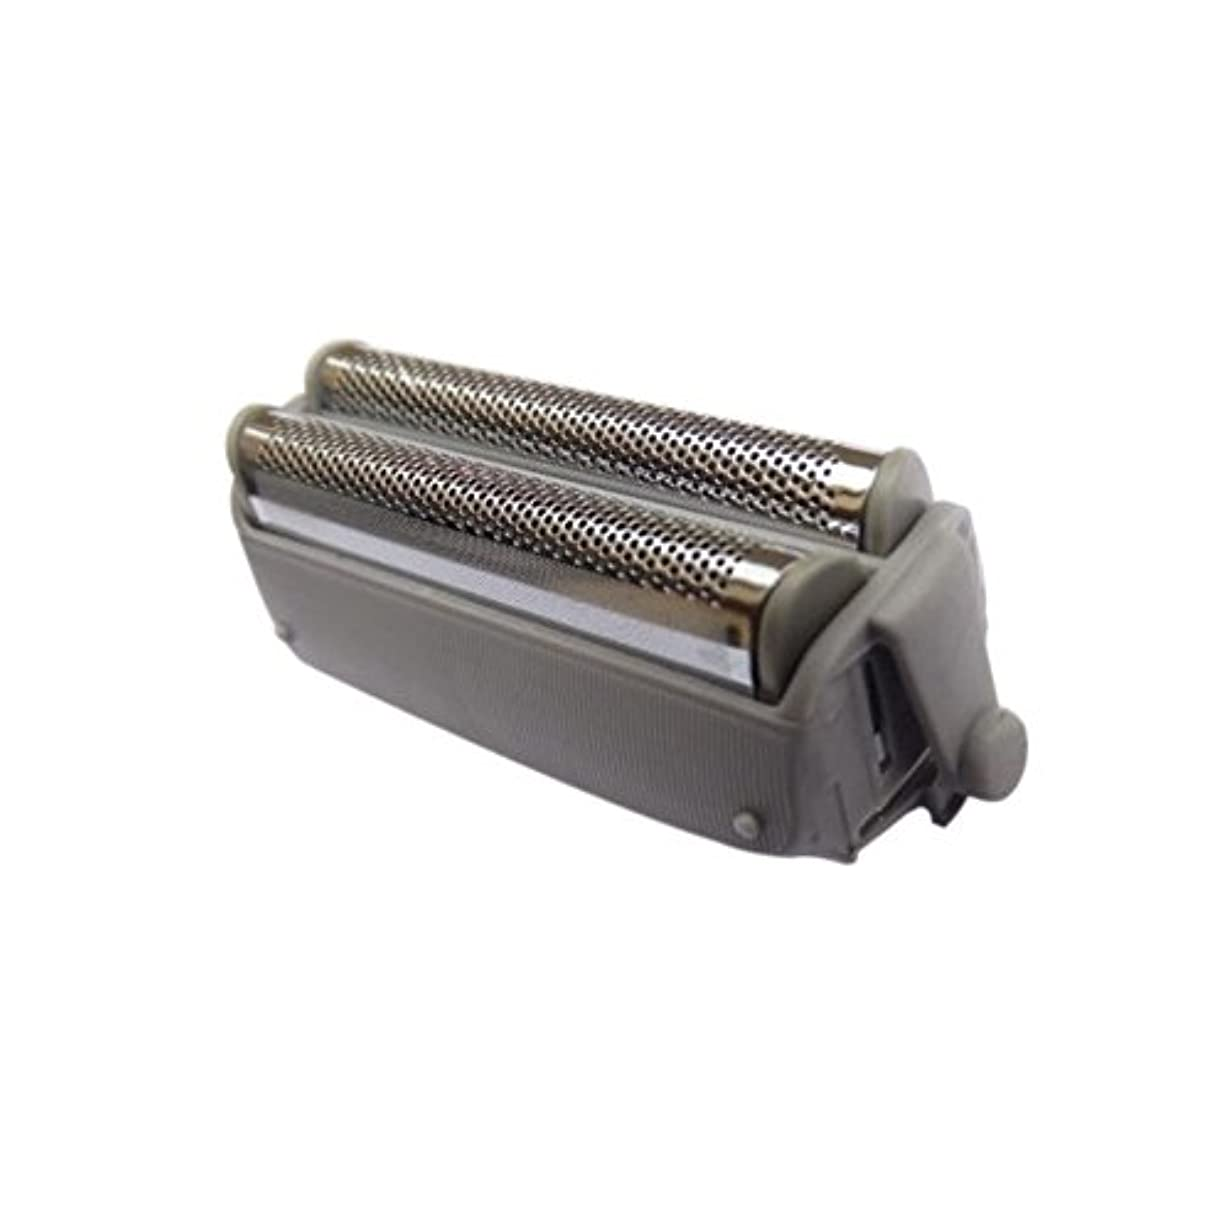 HZjundasi Replacement Outer ホイル for Panasonic ES4035/RW30 ES9859